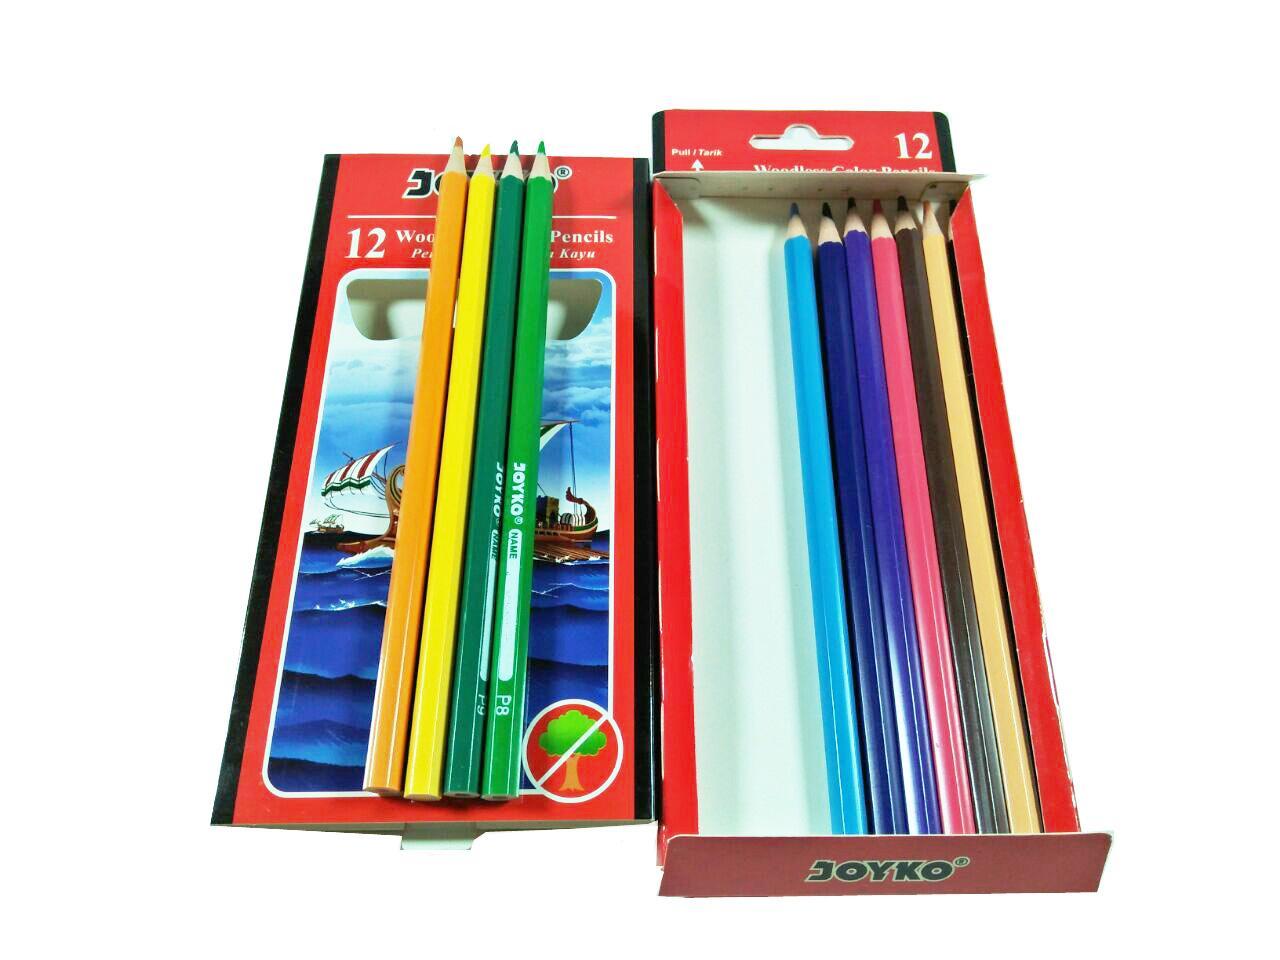 Alat gambar pensil pinsil warna Joyko isi 12 pcs